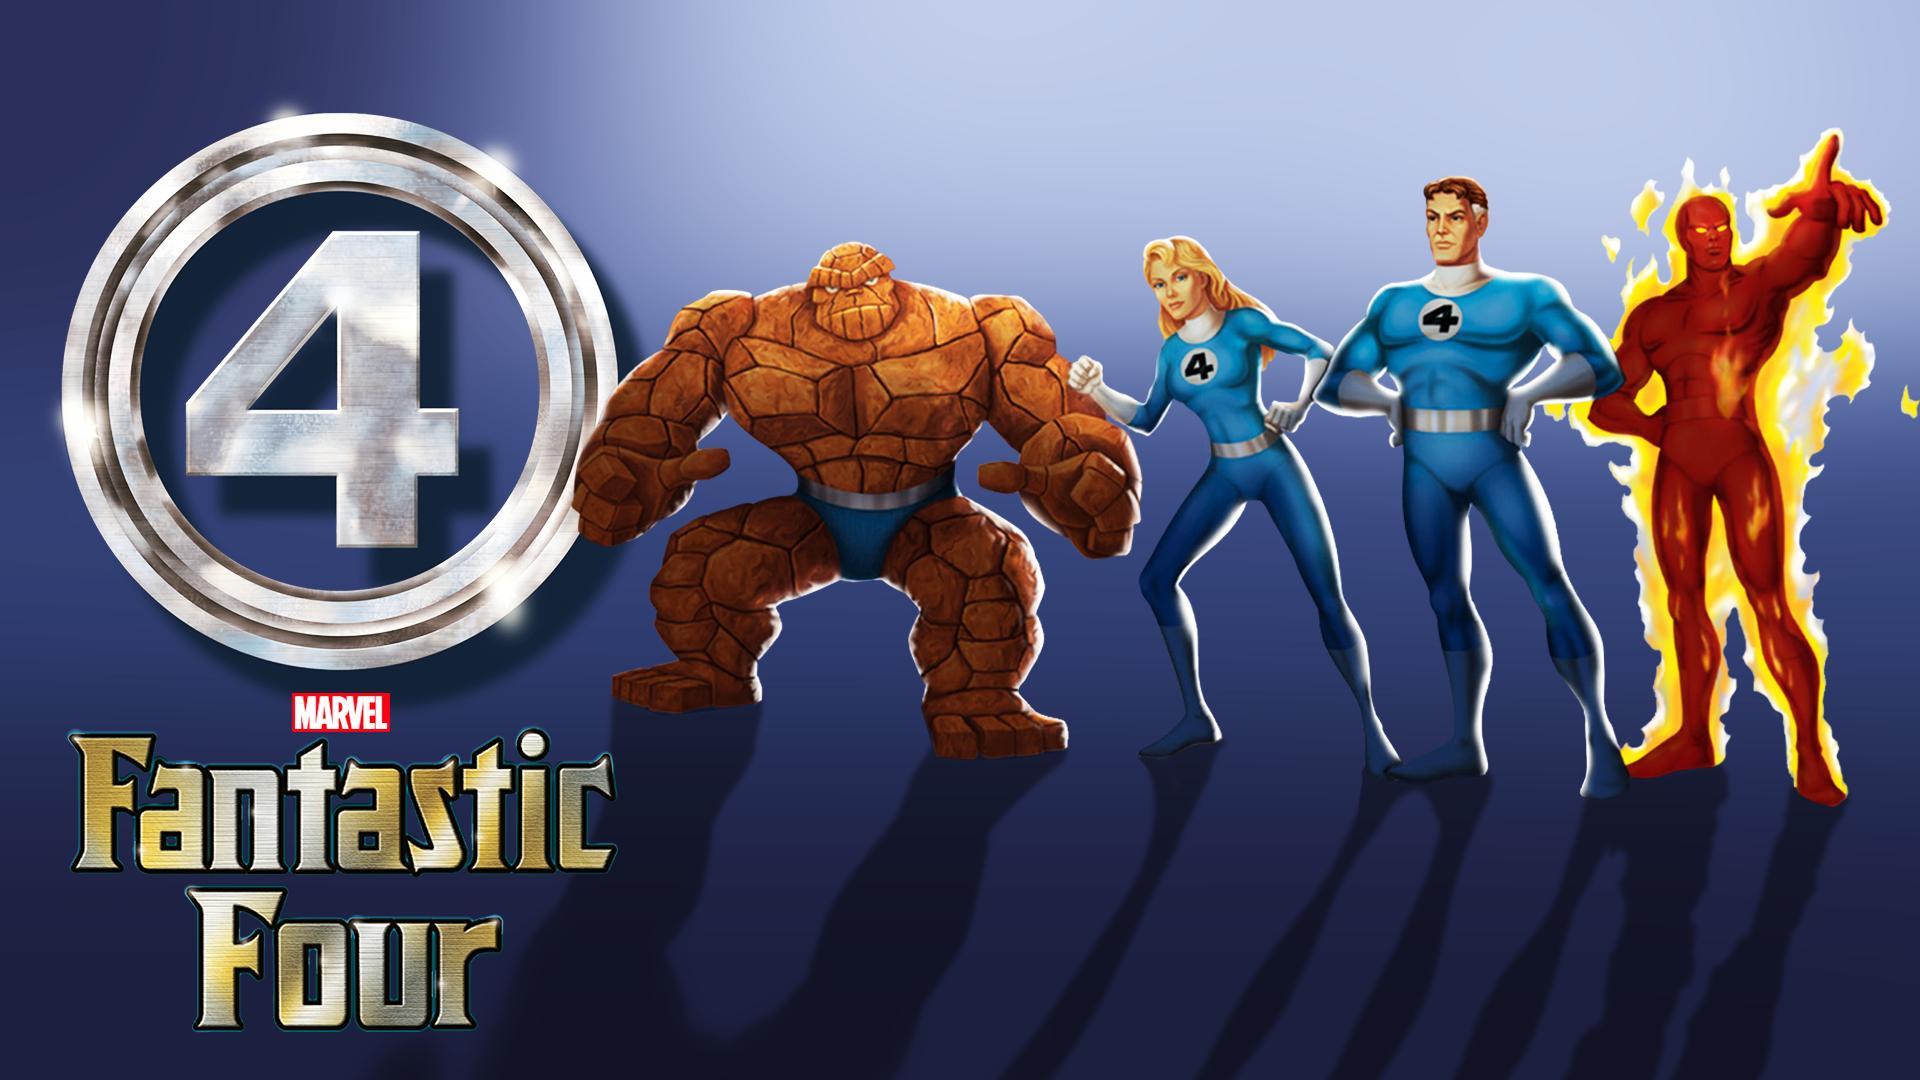 Fantastic Four (1994).jpg